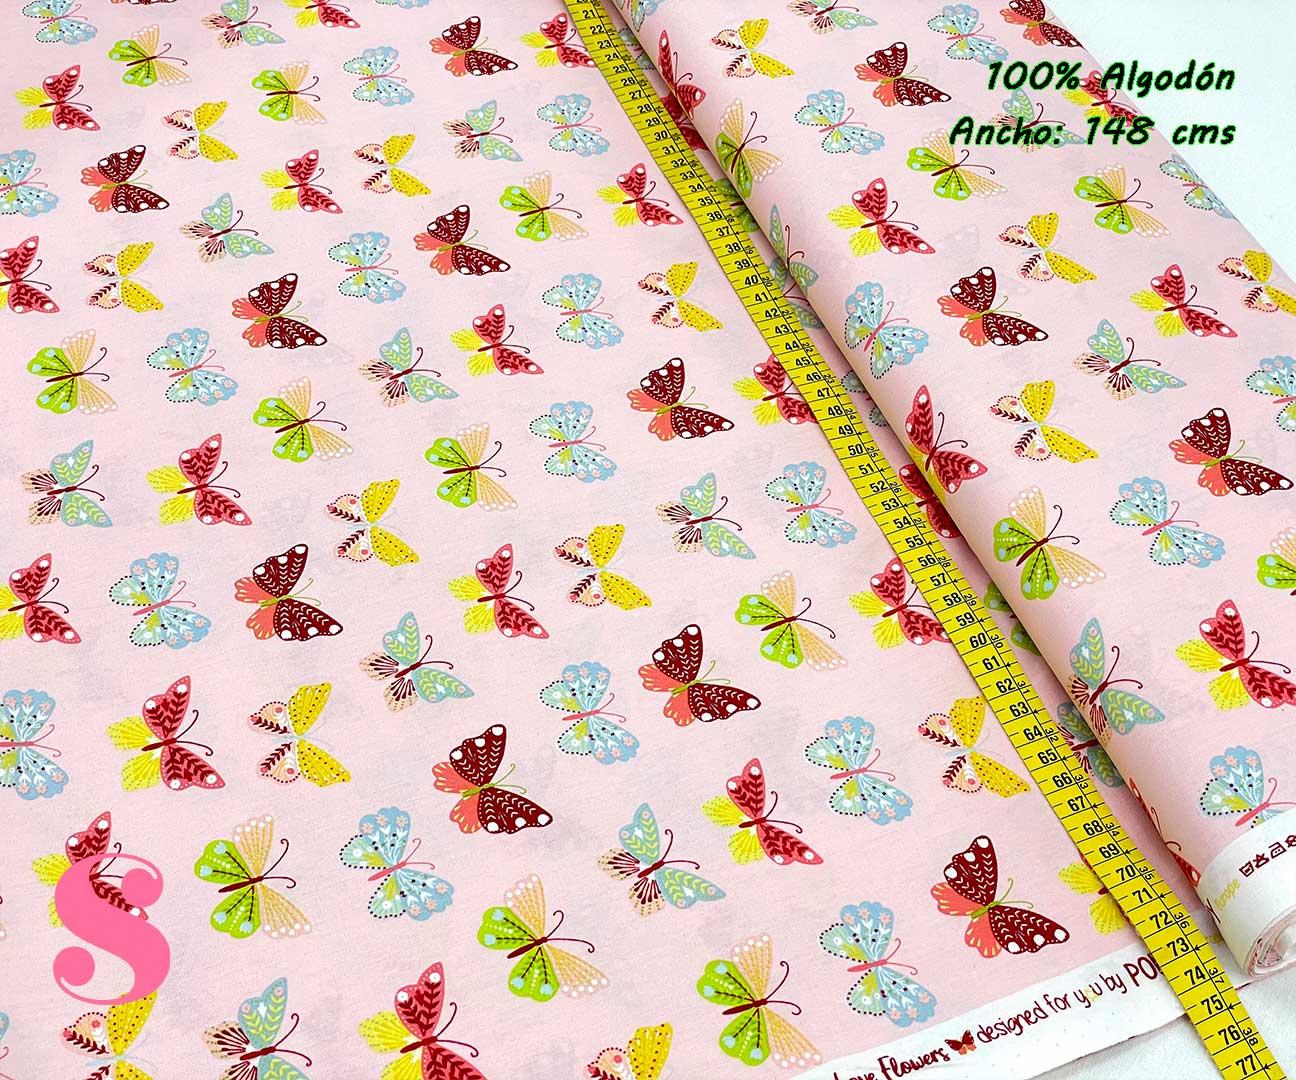 81-tela-estampada-flores,telas-dibujos-primaverales,telas-infantiles,tejidos-infantiles,Tejido Estampado Butterflys fondo Rosa